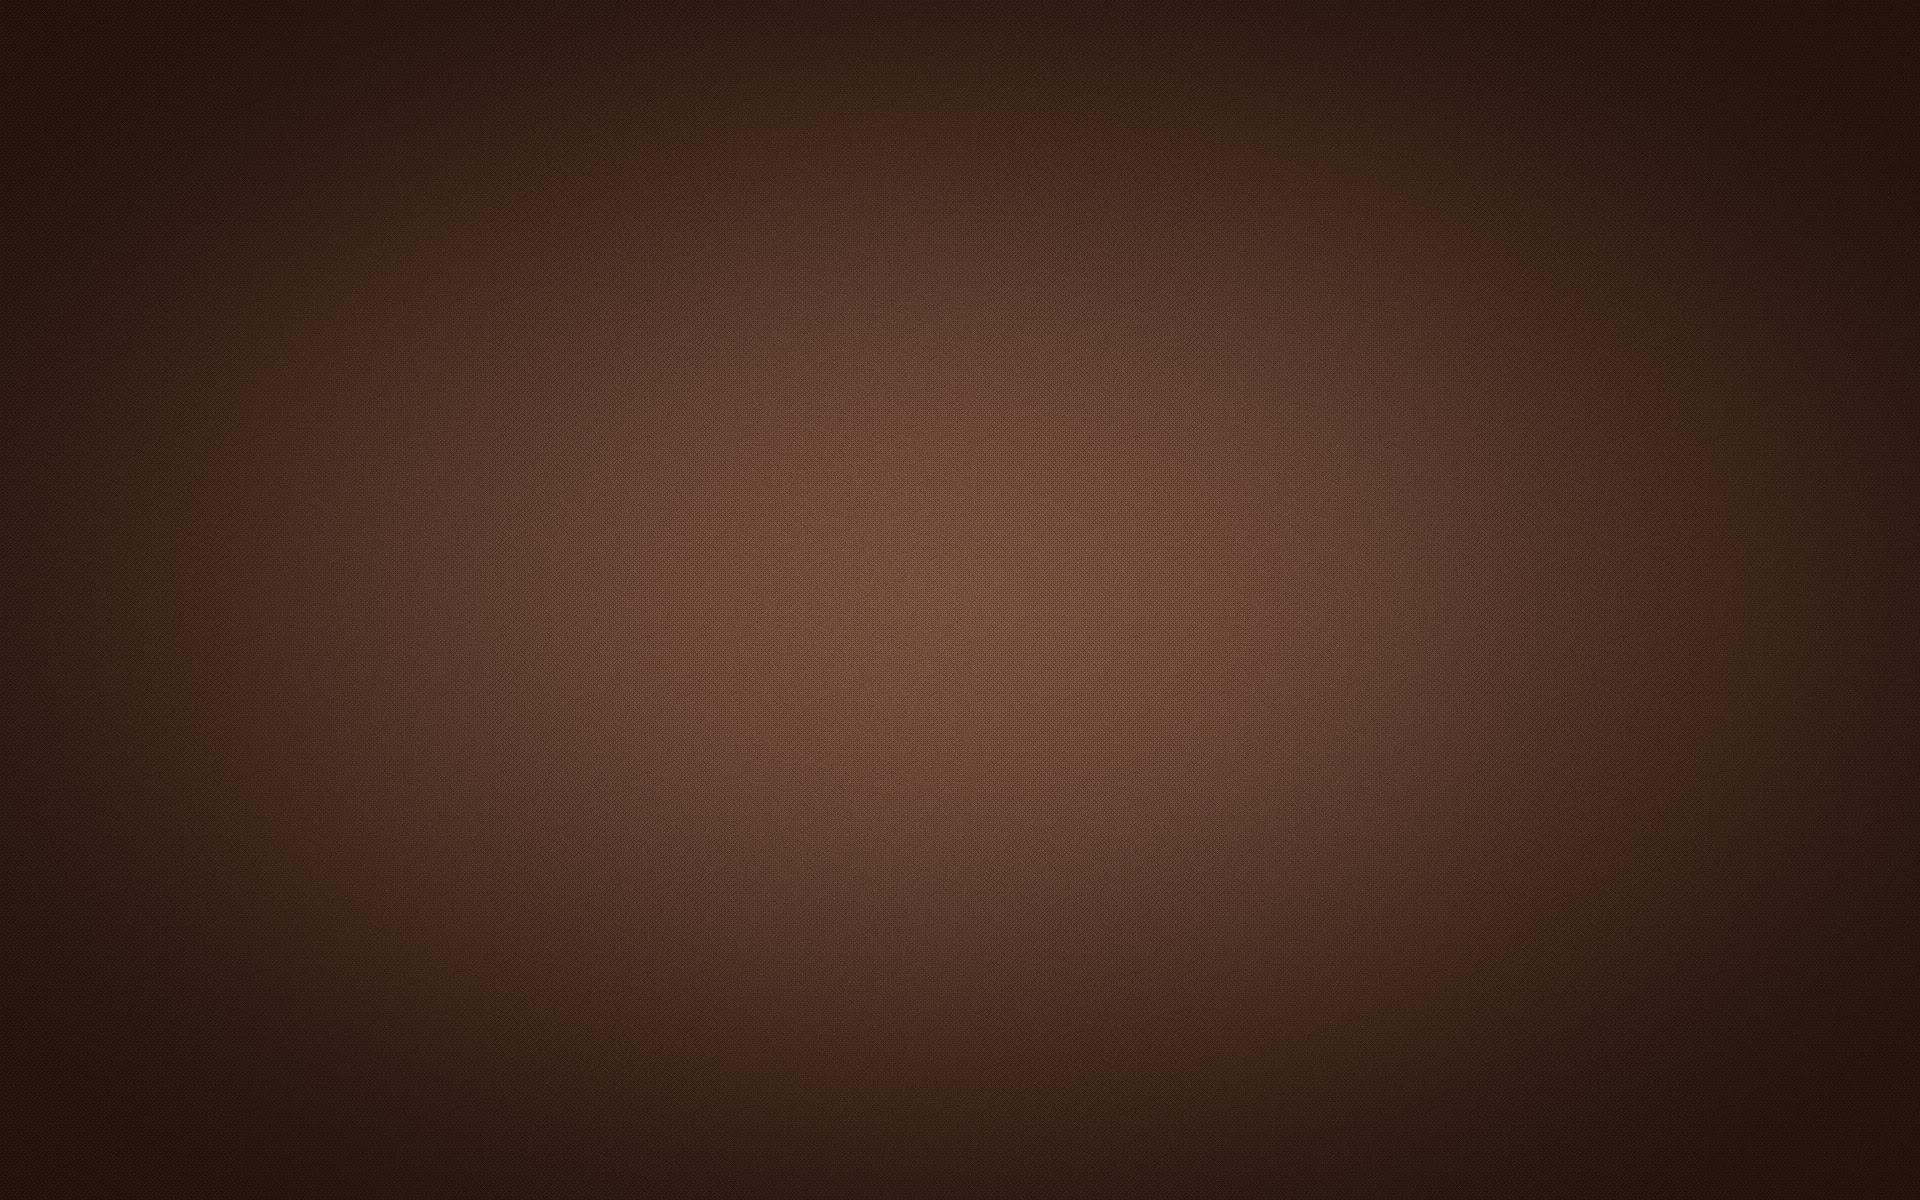 Unduh 530 Background Tumblr Coklat HD Terbaru